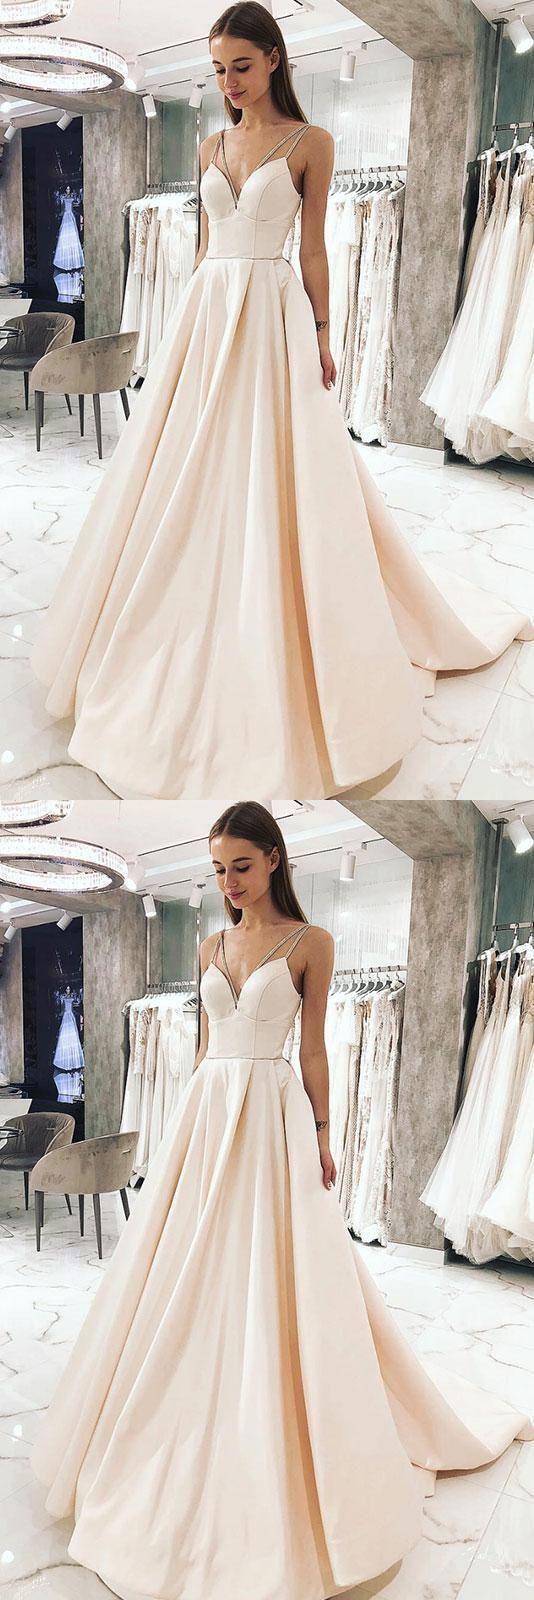 Sexy V neck Long Wedding Dress, Sleeveless Wedding Dresses,  2019 Bridal Gowns